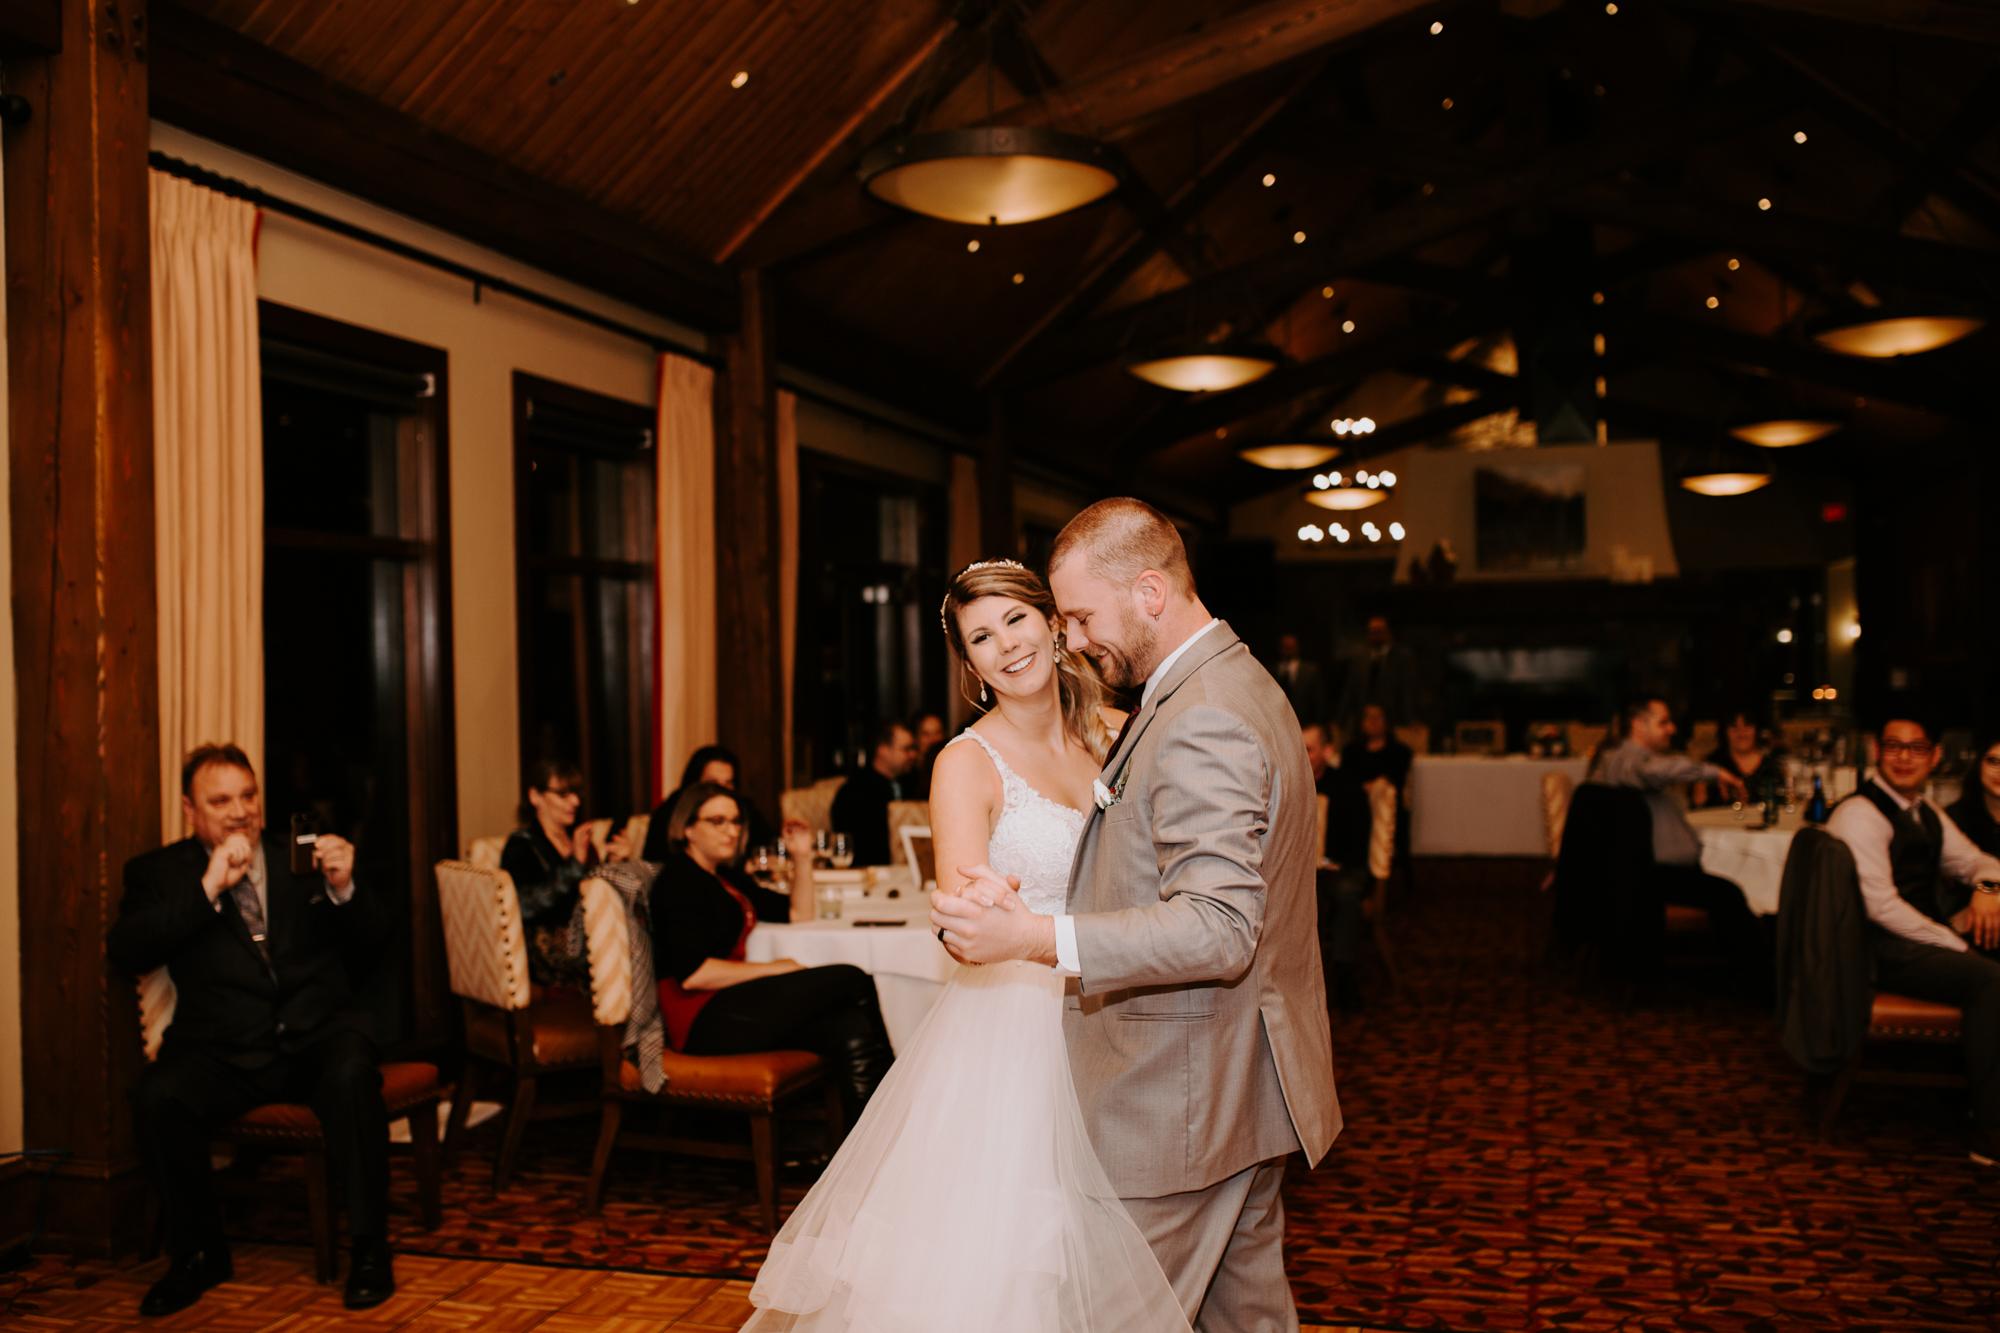 Stewart-Creek-Wedding-AJ-85.jpg